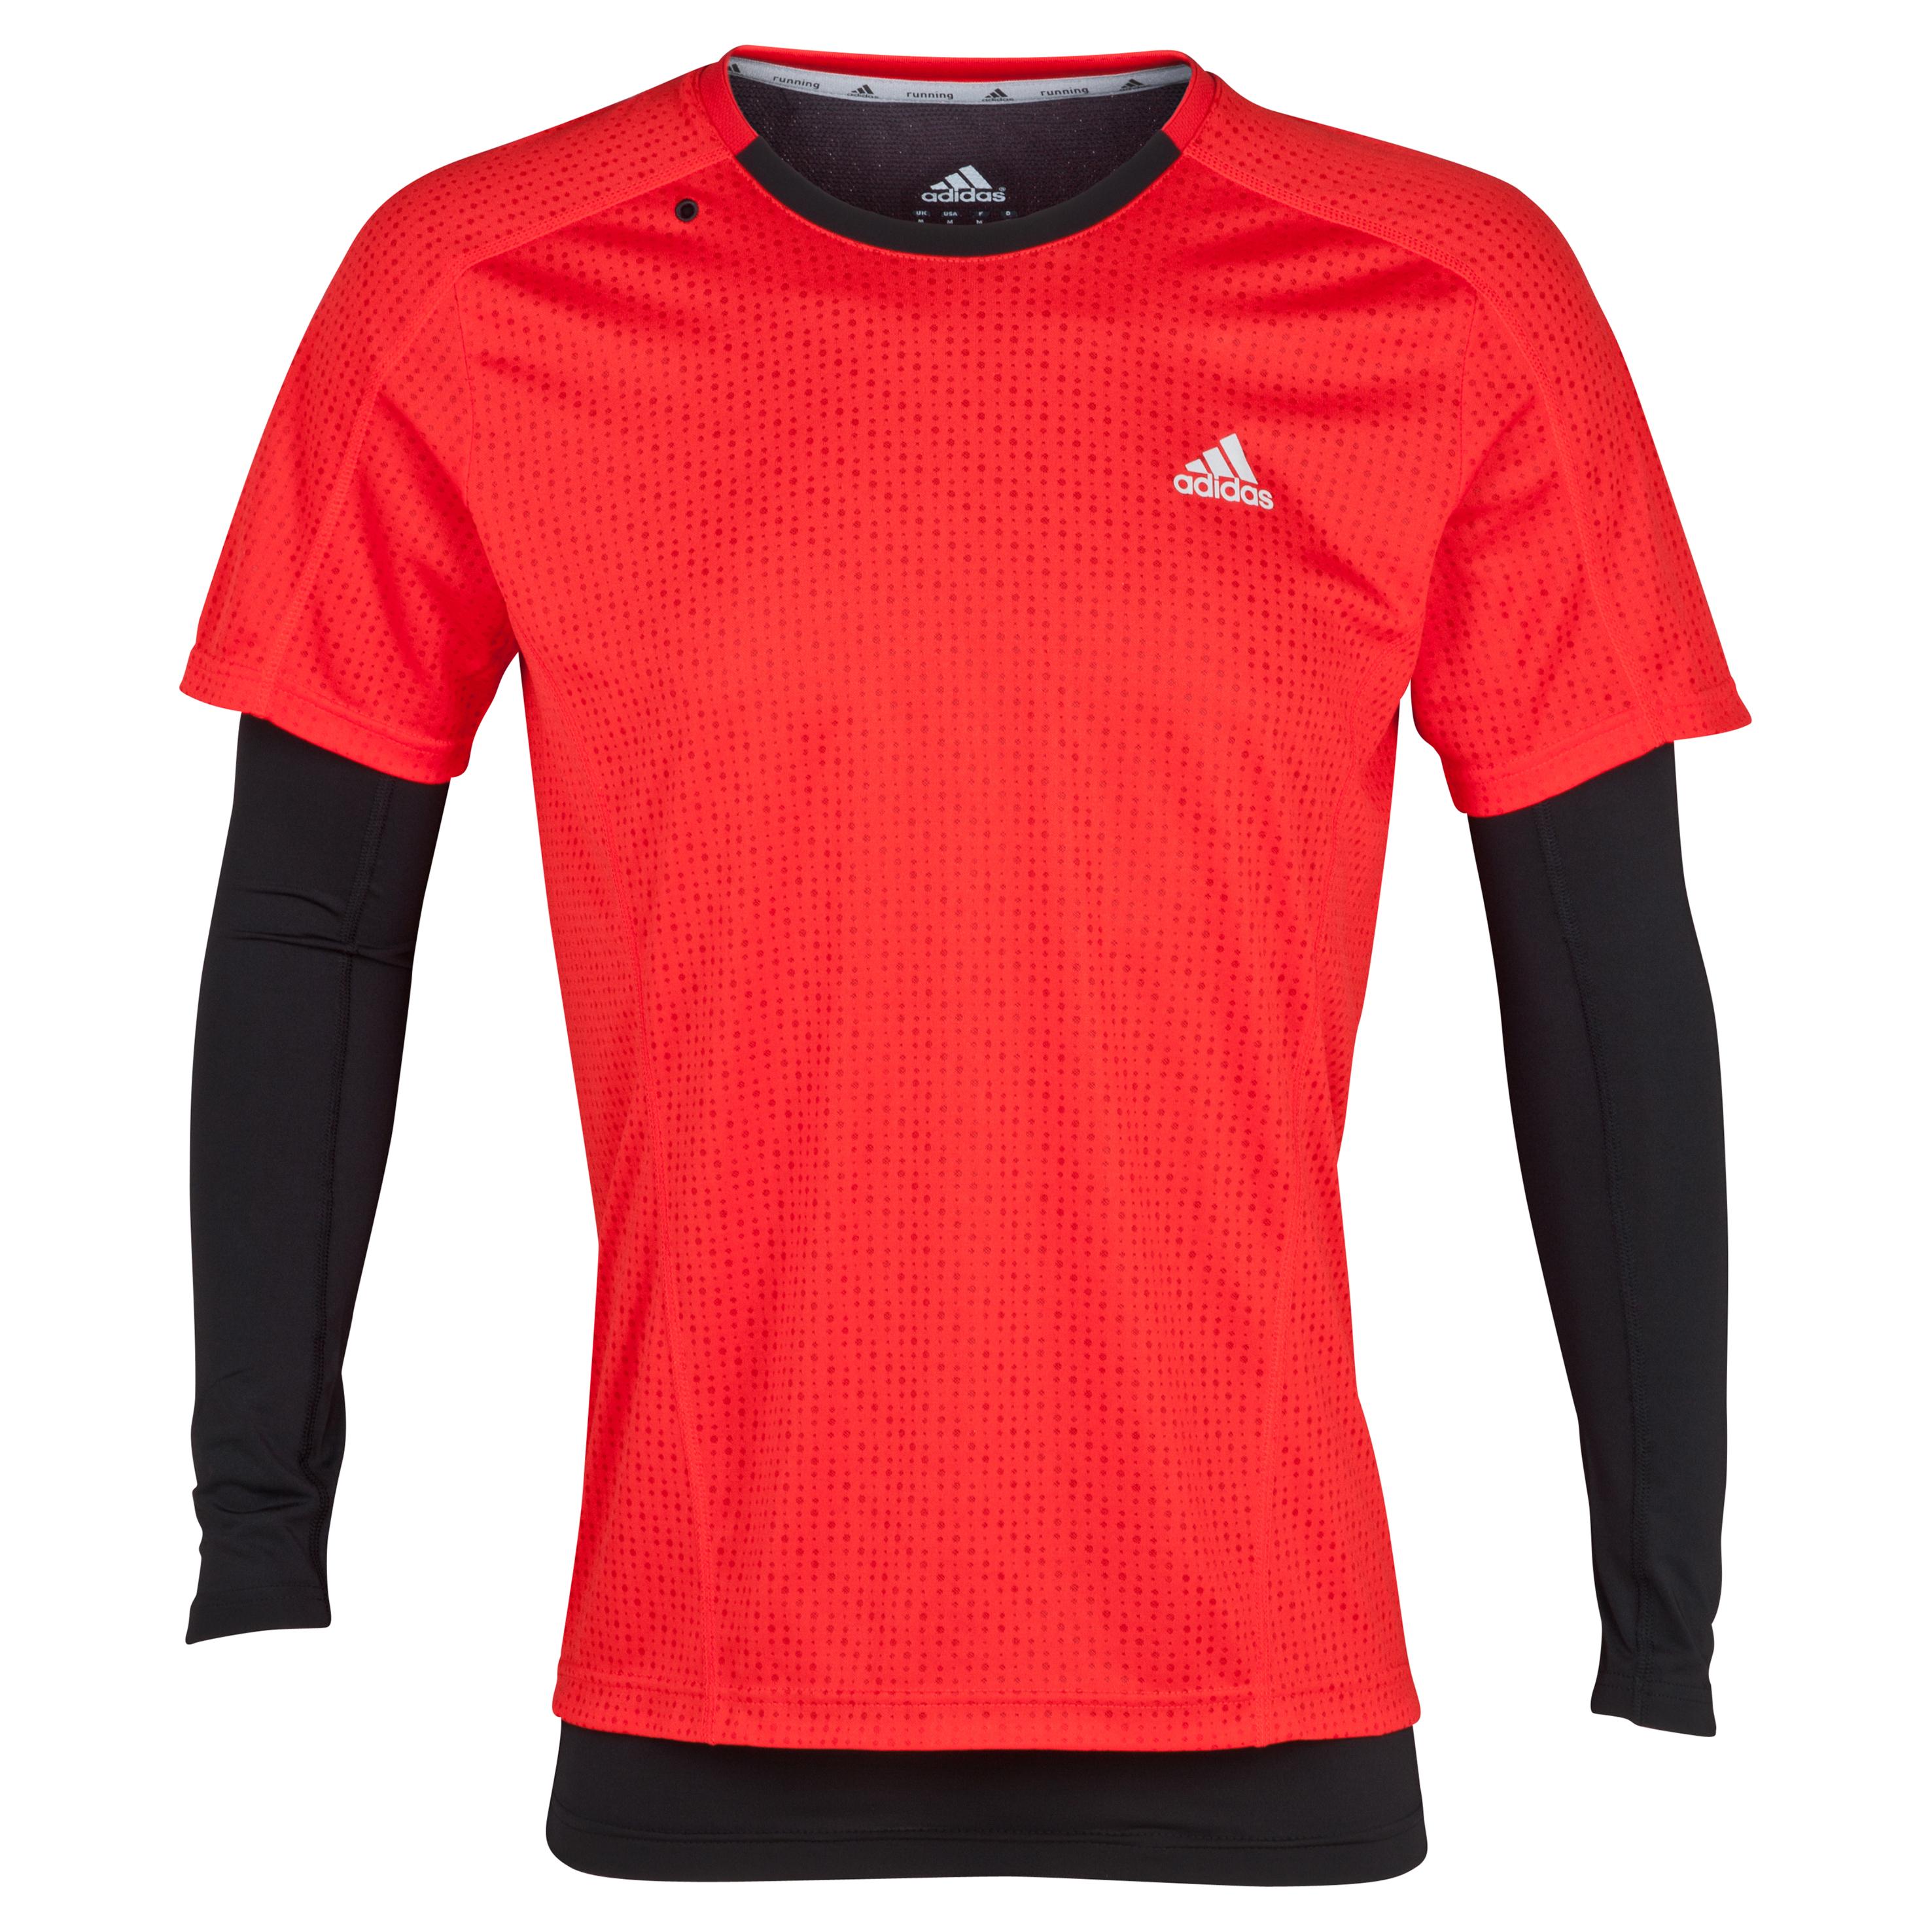 Adidas Supernova 2in1 T-Shirt - Long Sleeve - Vivid Red/Black